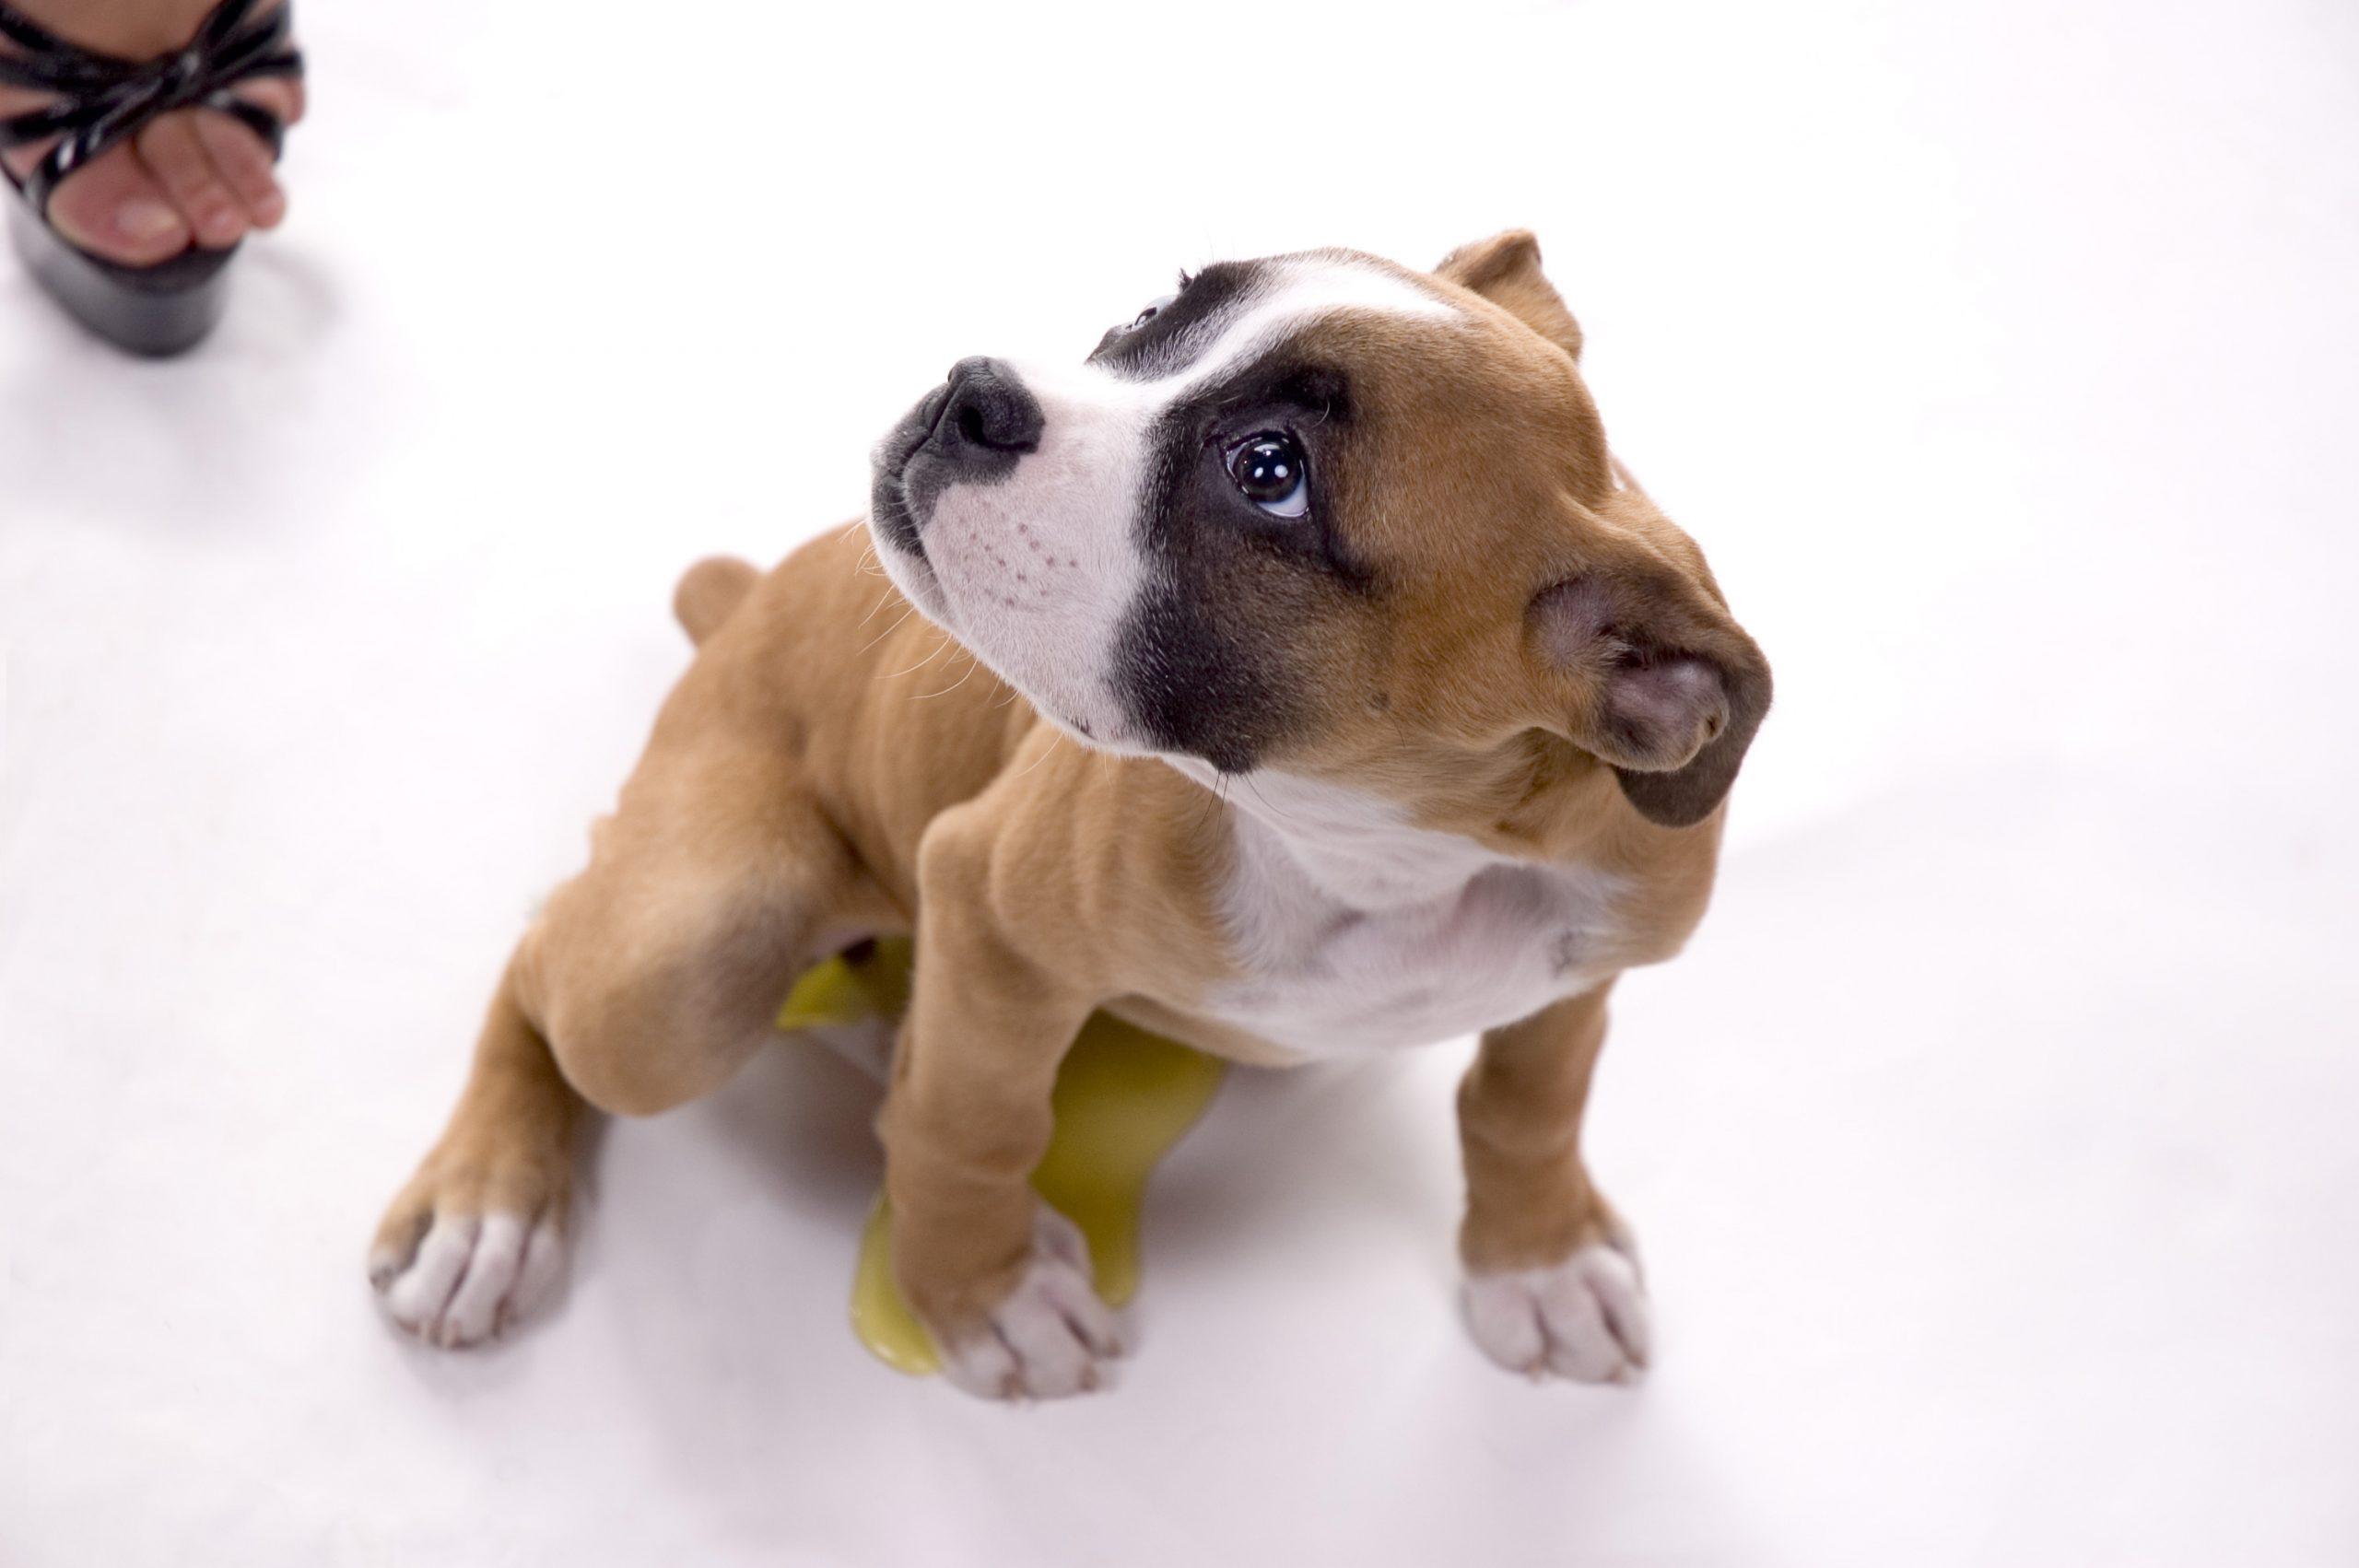 Submissing dog pee